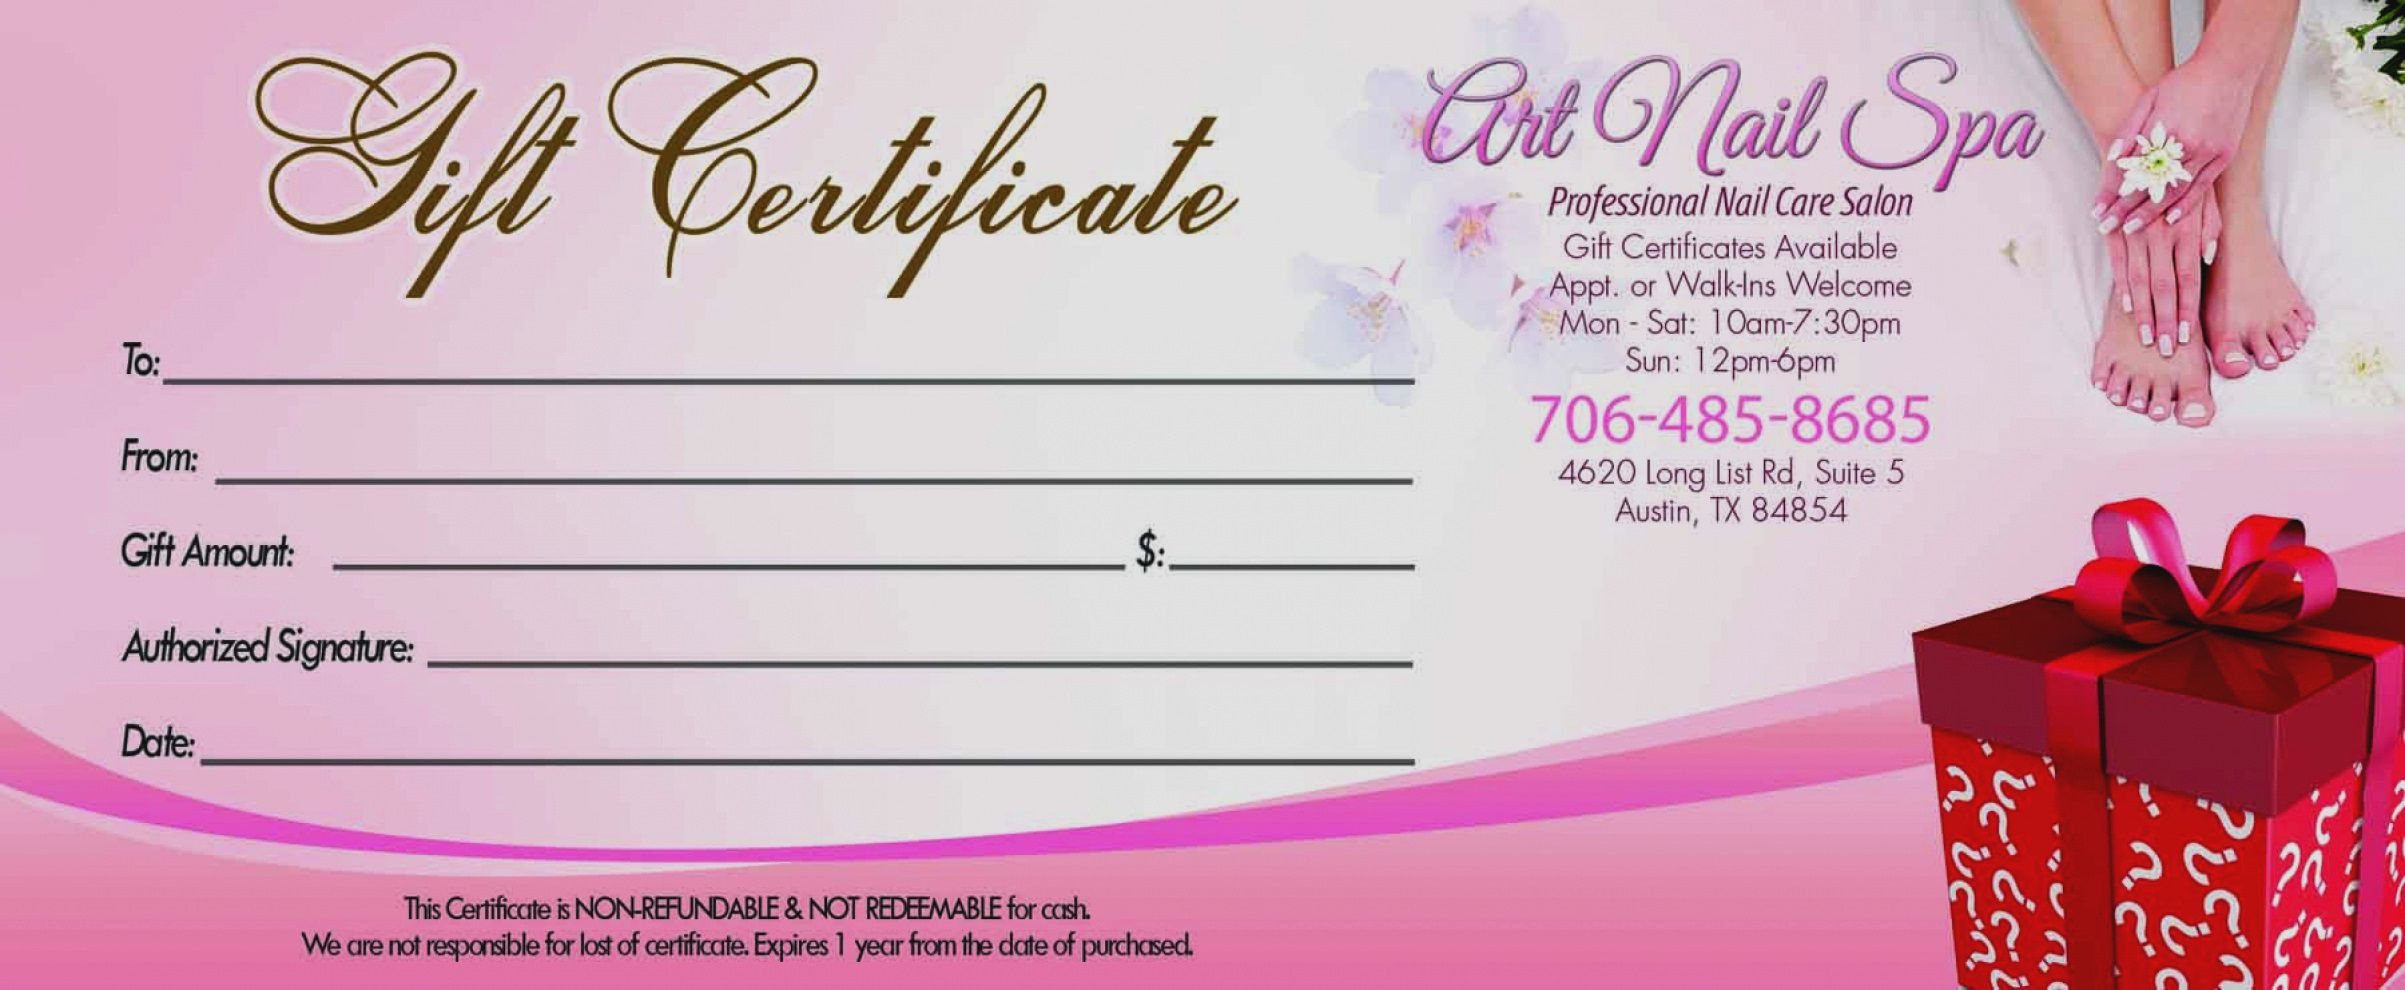 002 Fantastic Salon Gift Certificate Template Image Full